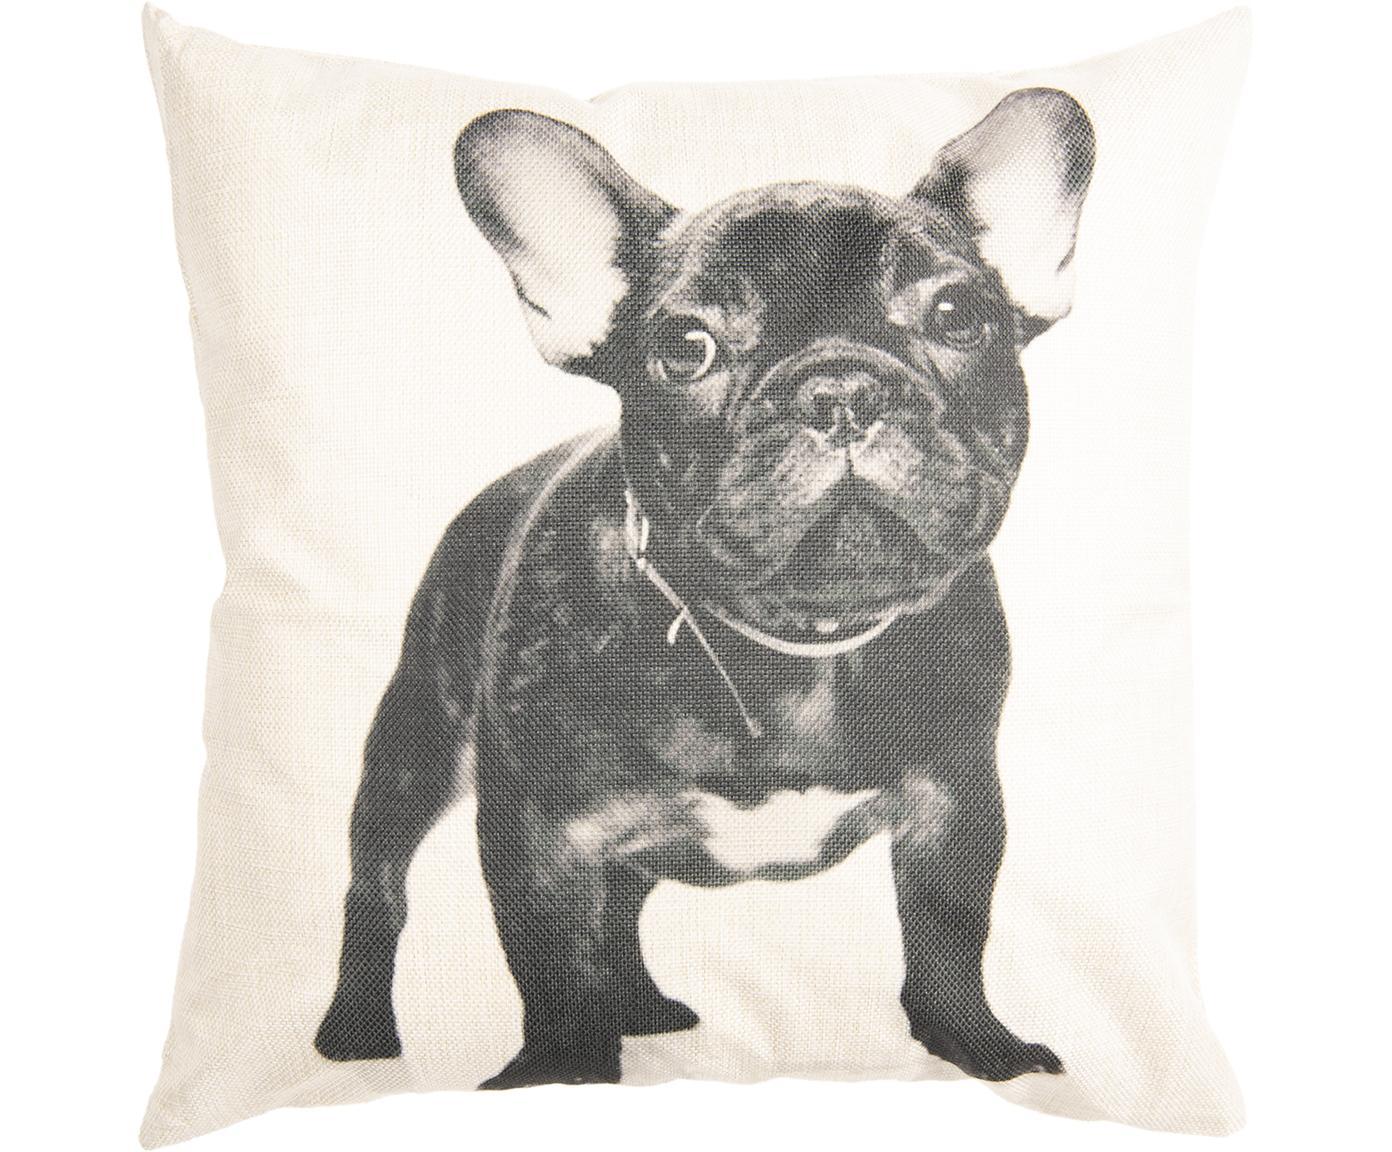 Federa arredo Dog, Poliestere, Bianco latteo, nero, Larg. 45 x Lung. 45 cm